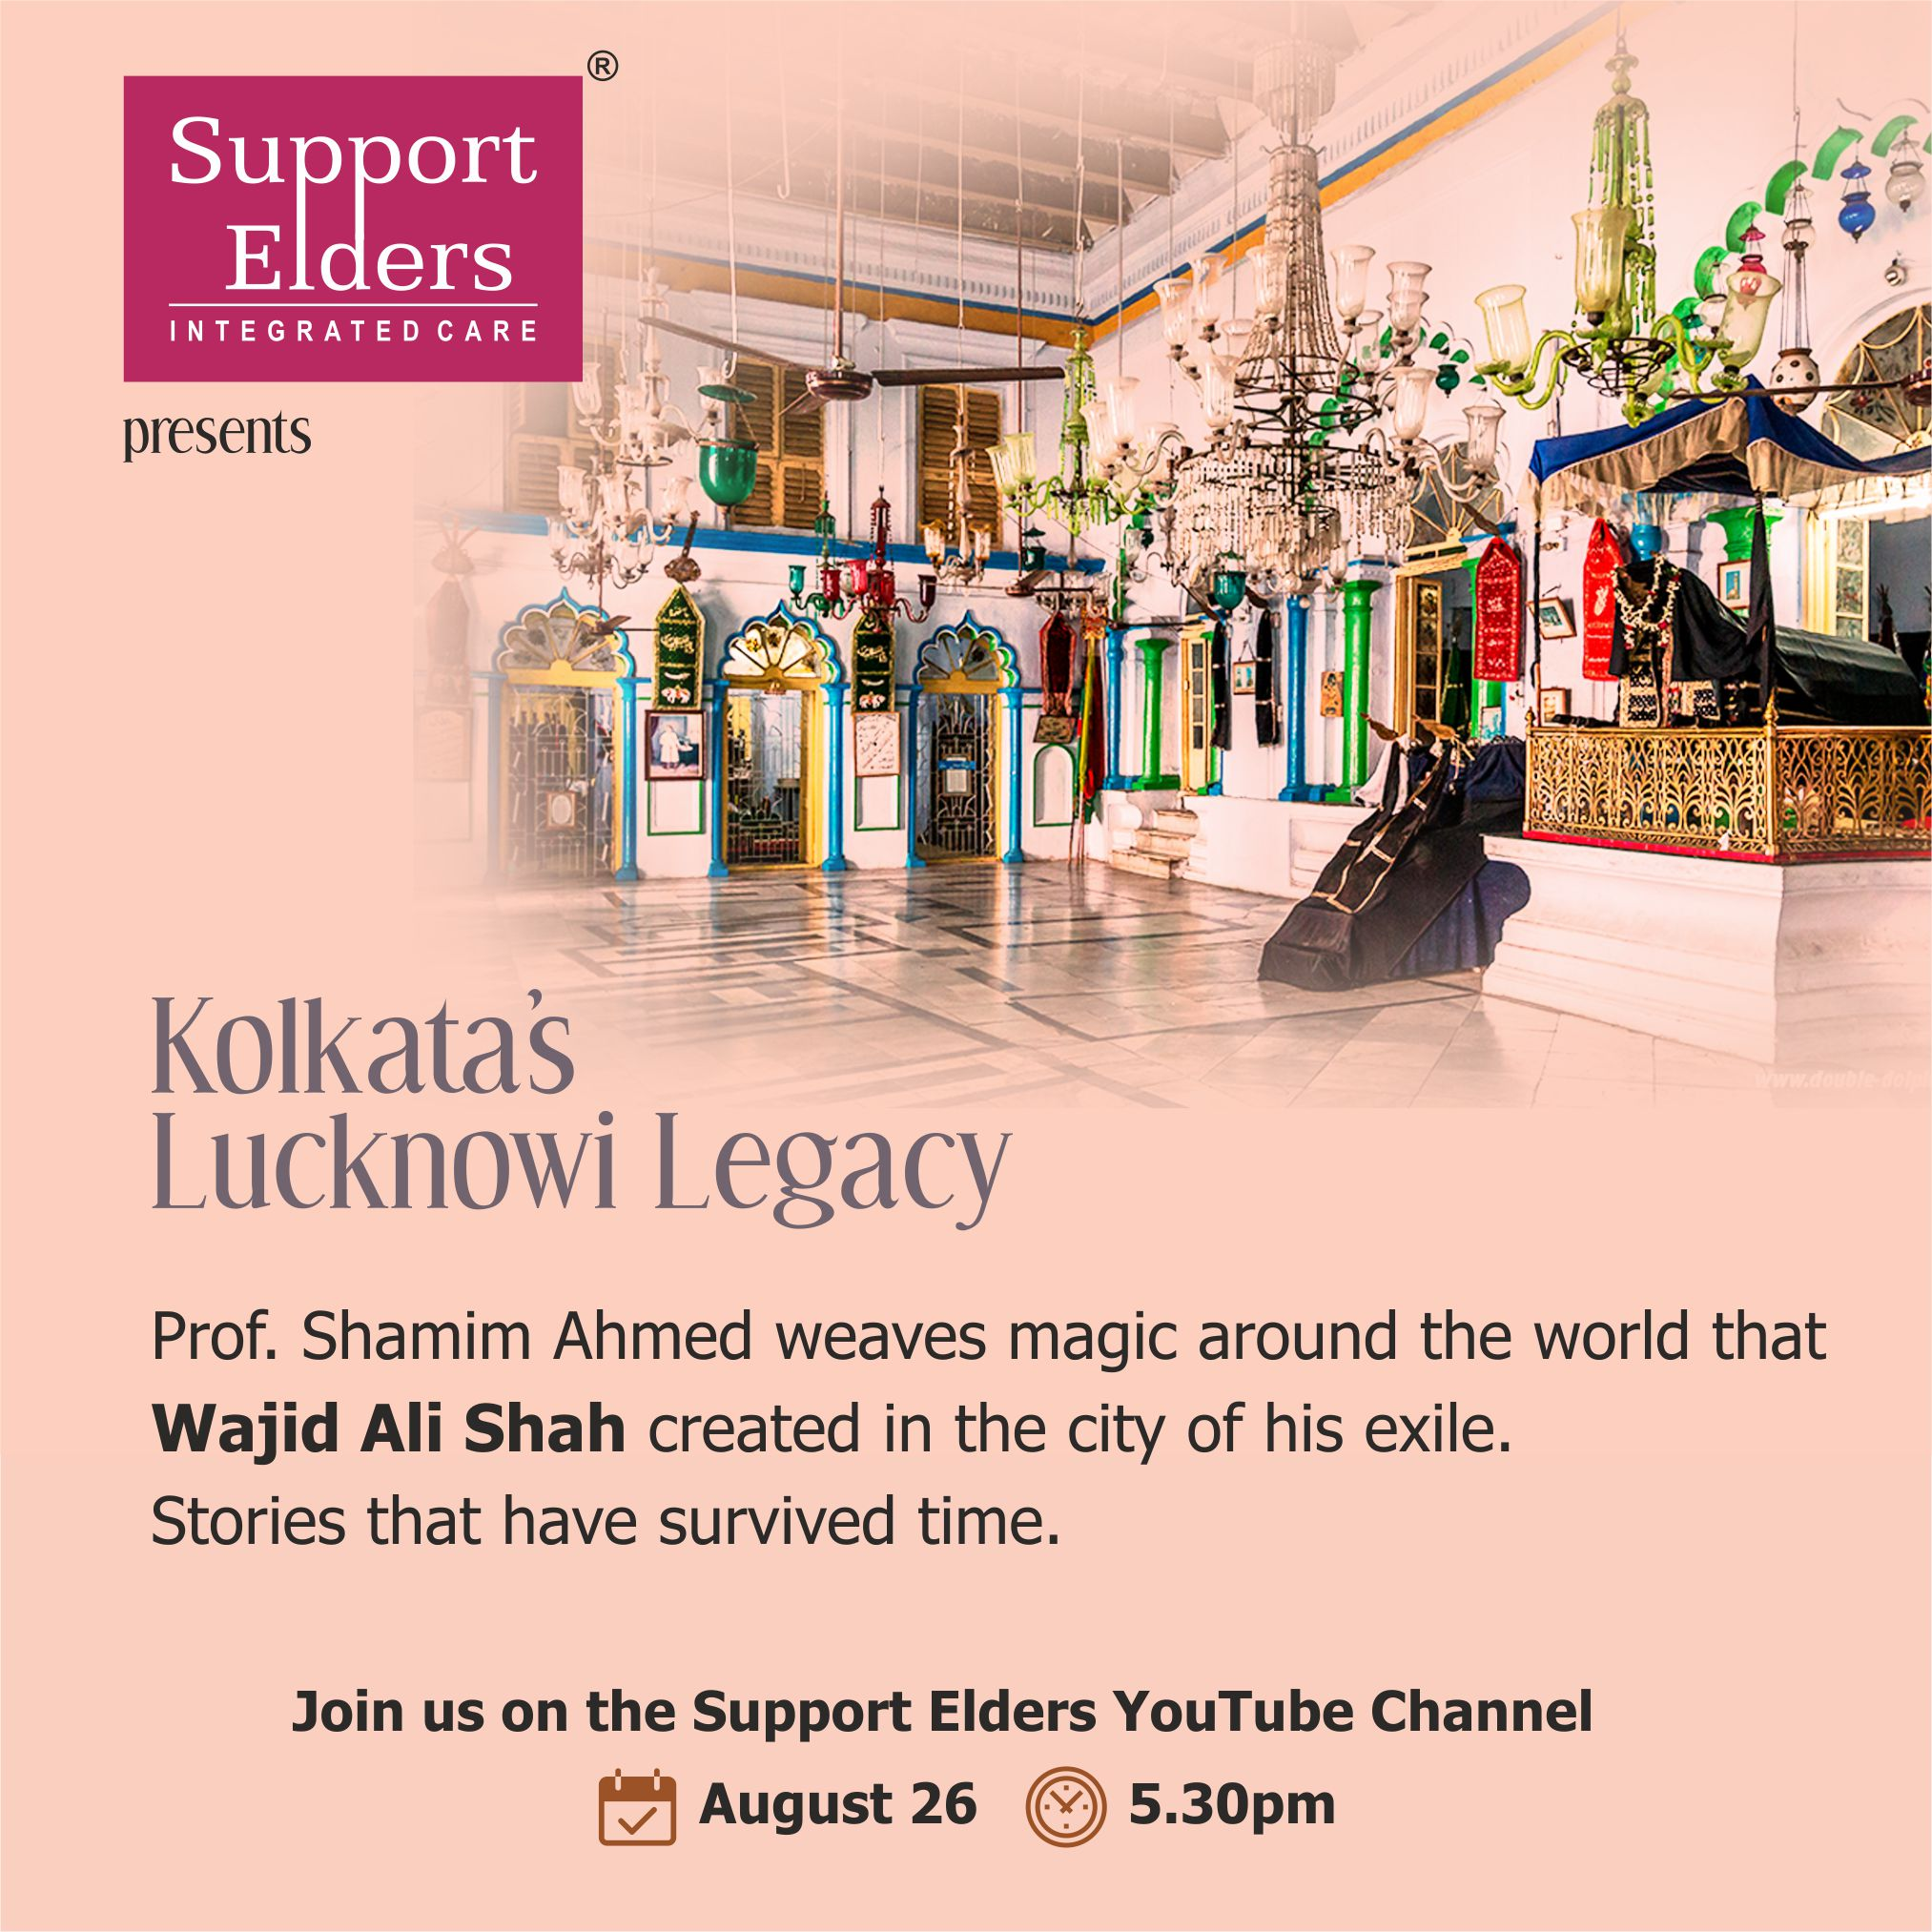 Kolkata's Lucknowi Legacy Final.jpg